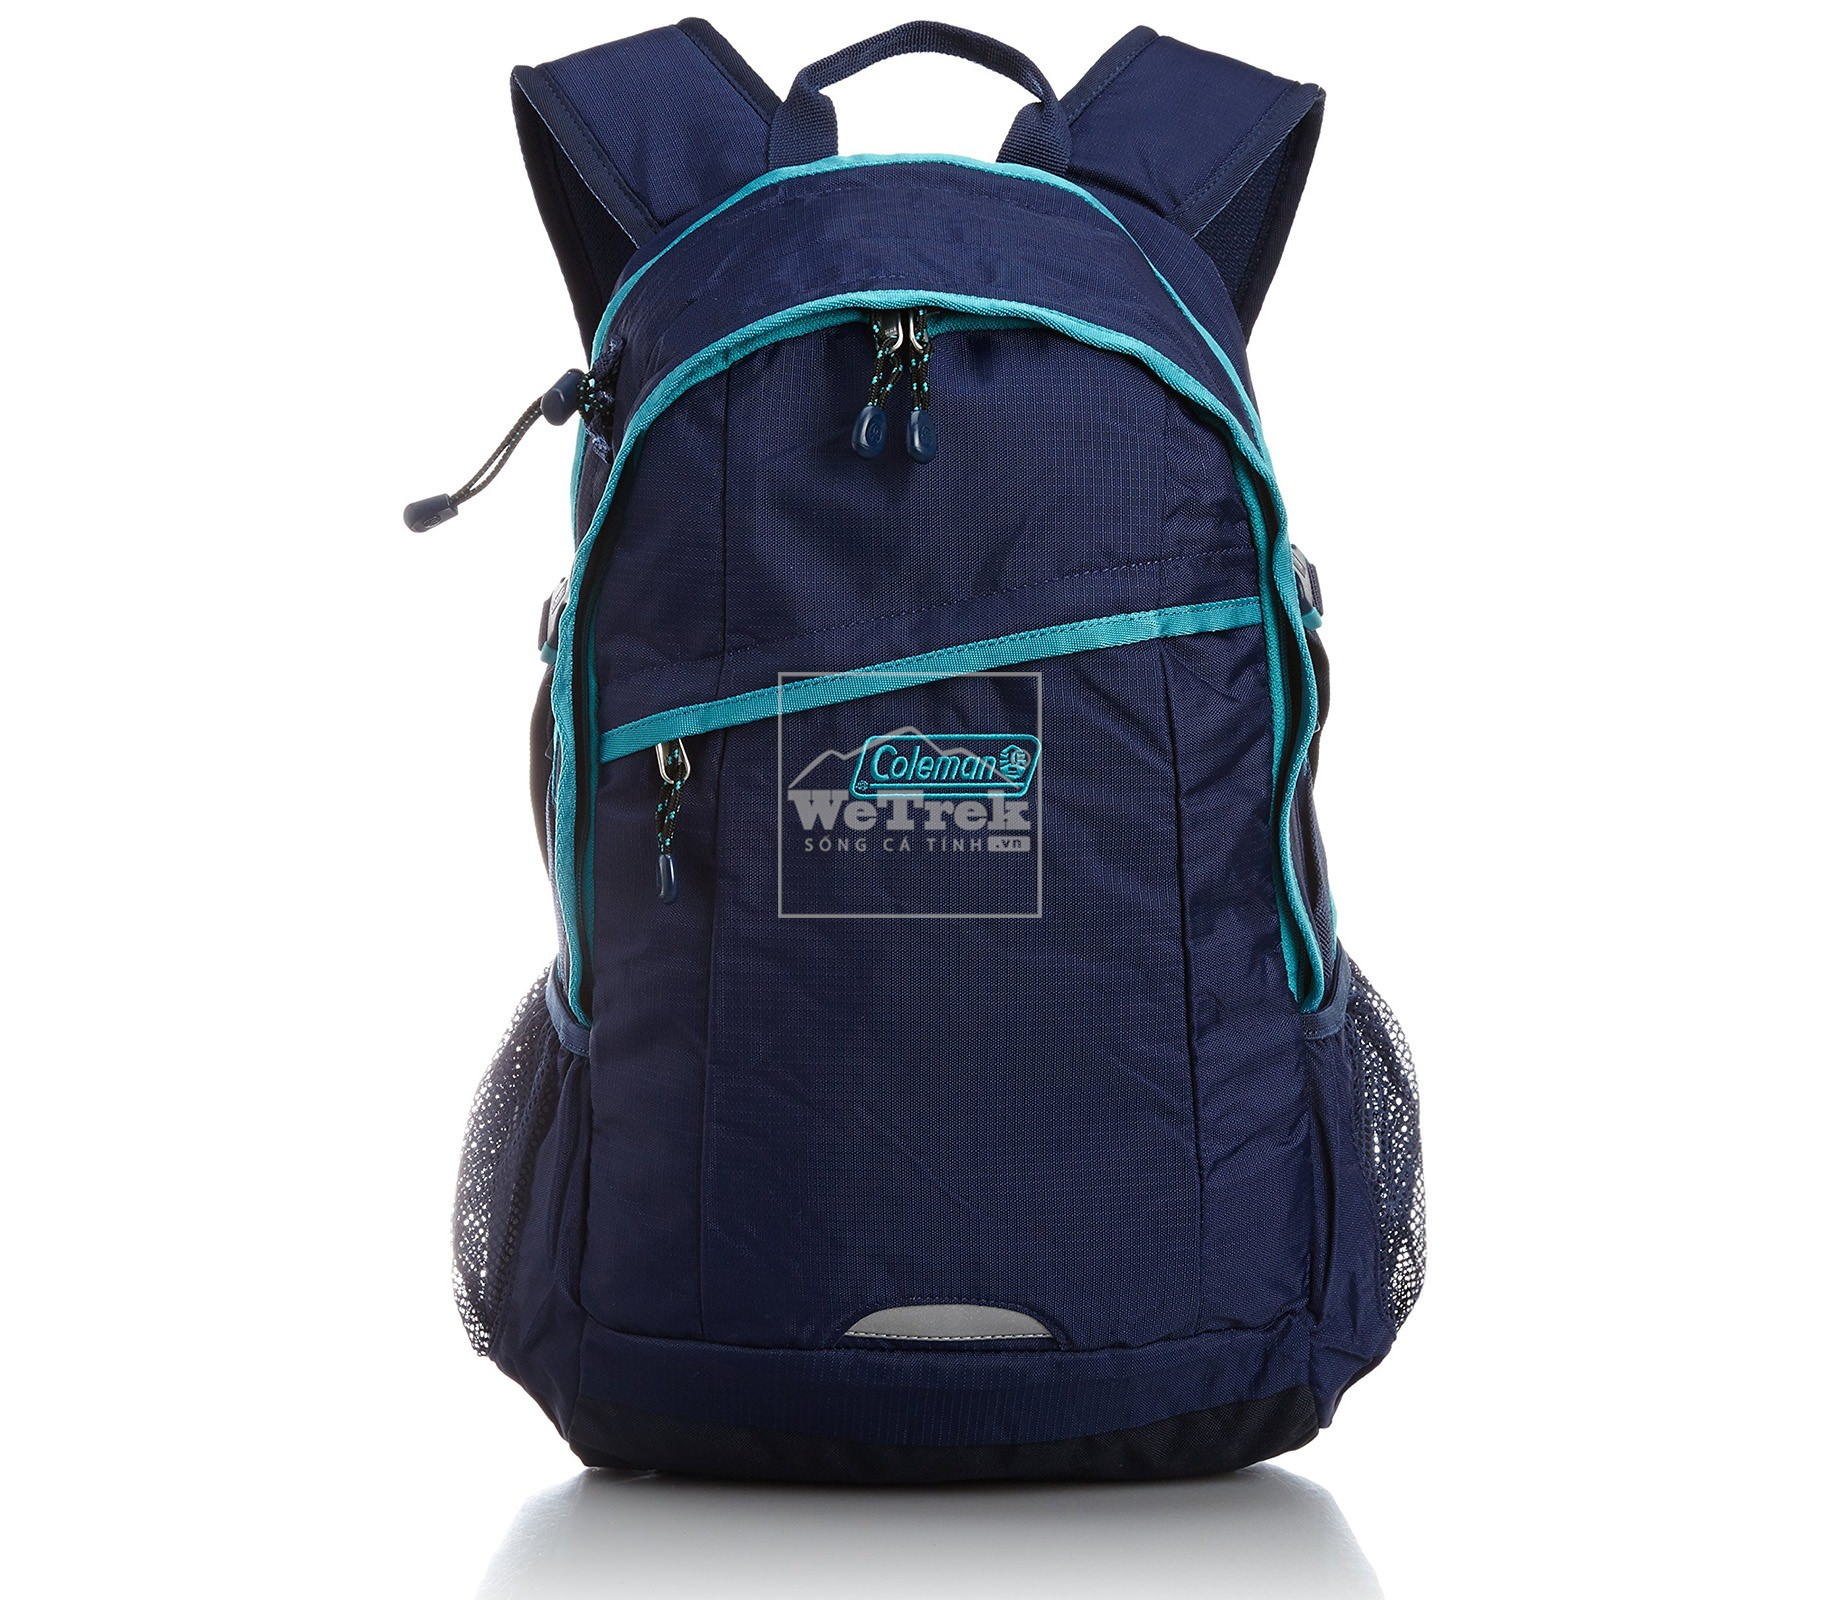 Ba lô 25L Coleman Walker Deep Blue 2000021363 - 7601